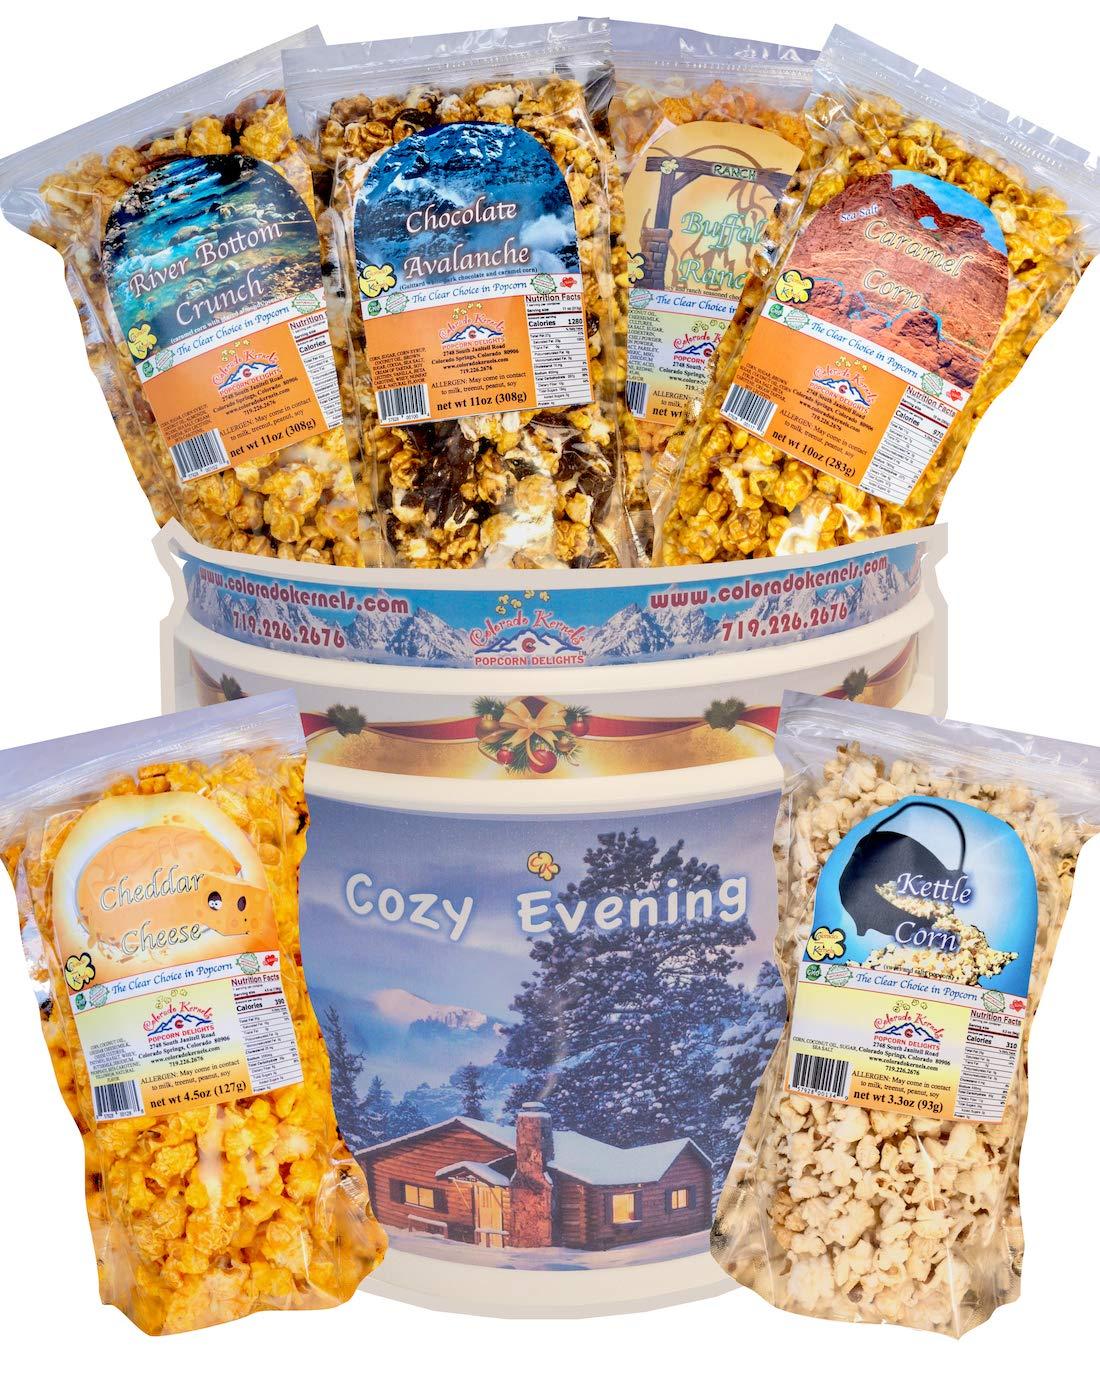 SIX FLAVOR POPCORN BUCKET - popcorn gift set